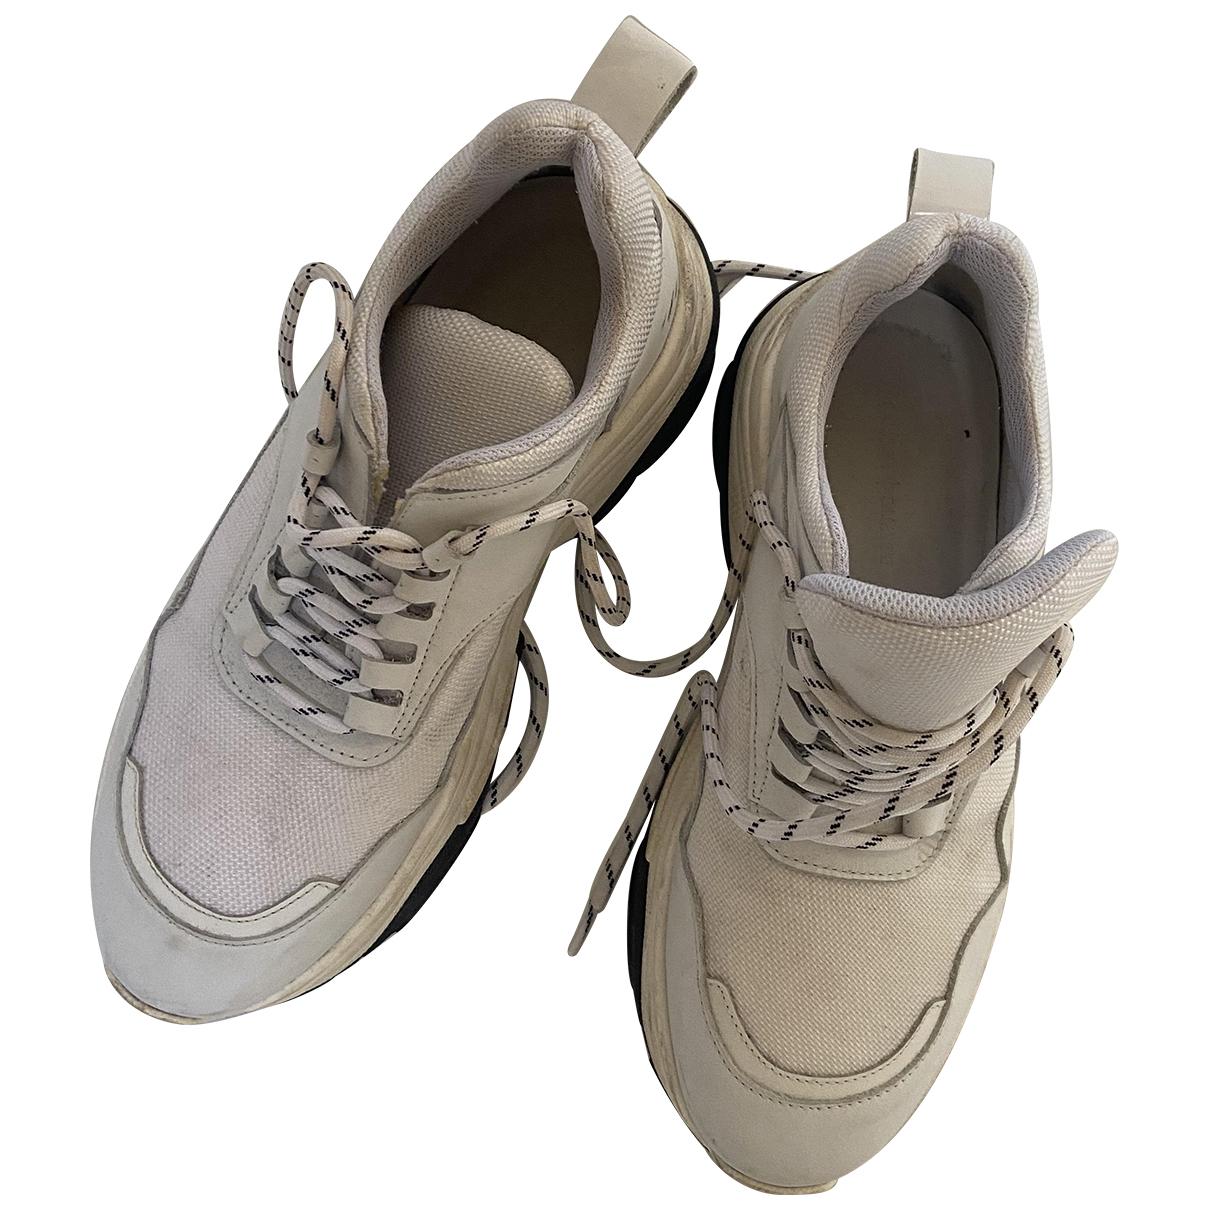 Samsoe & Samsoe \N Sneakers in  Weiss Leinen